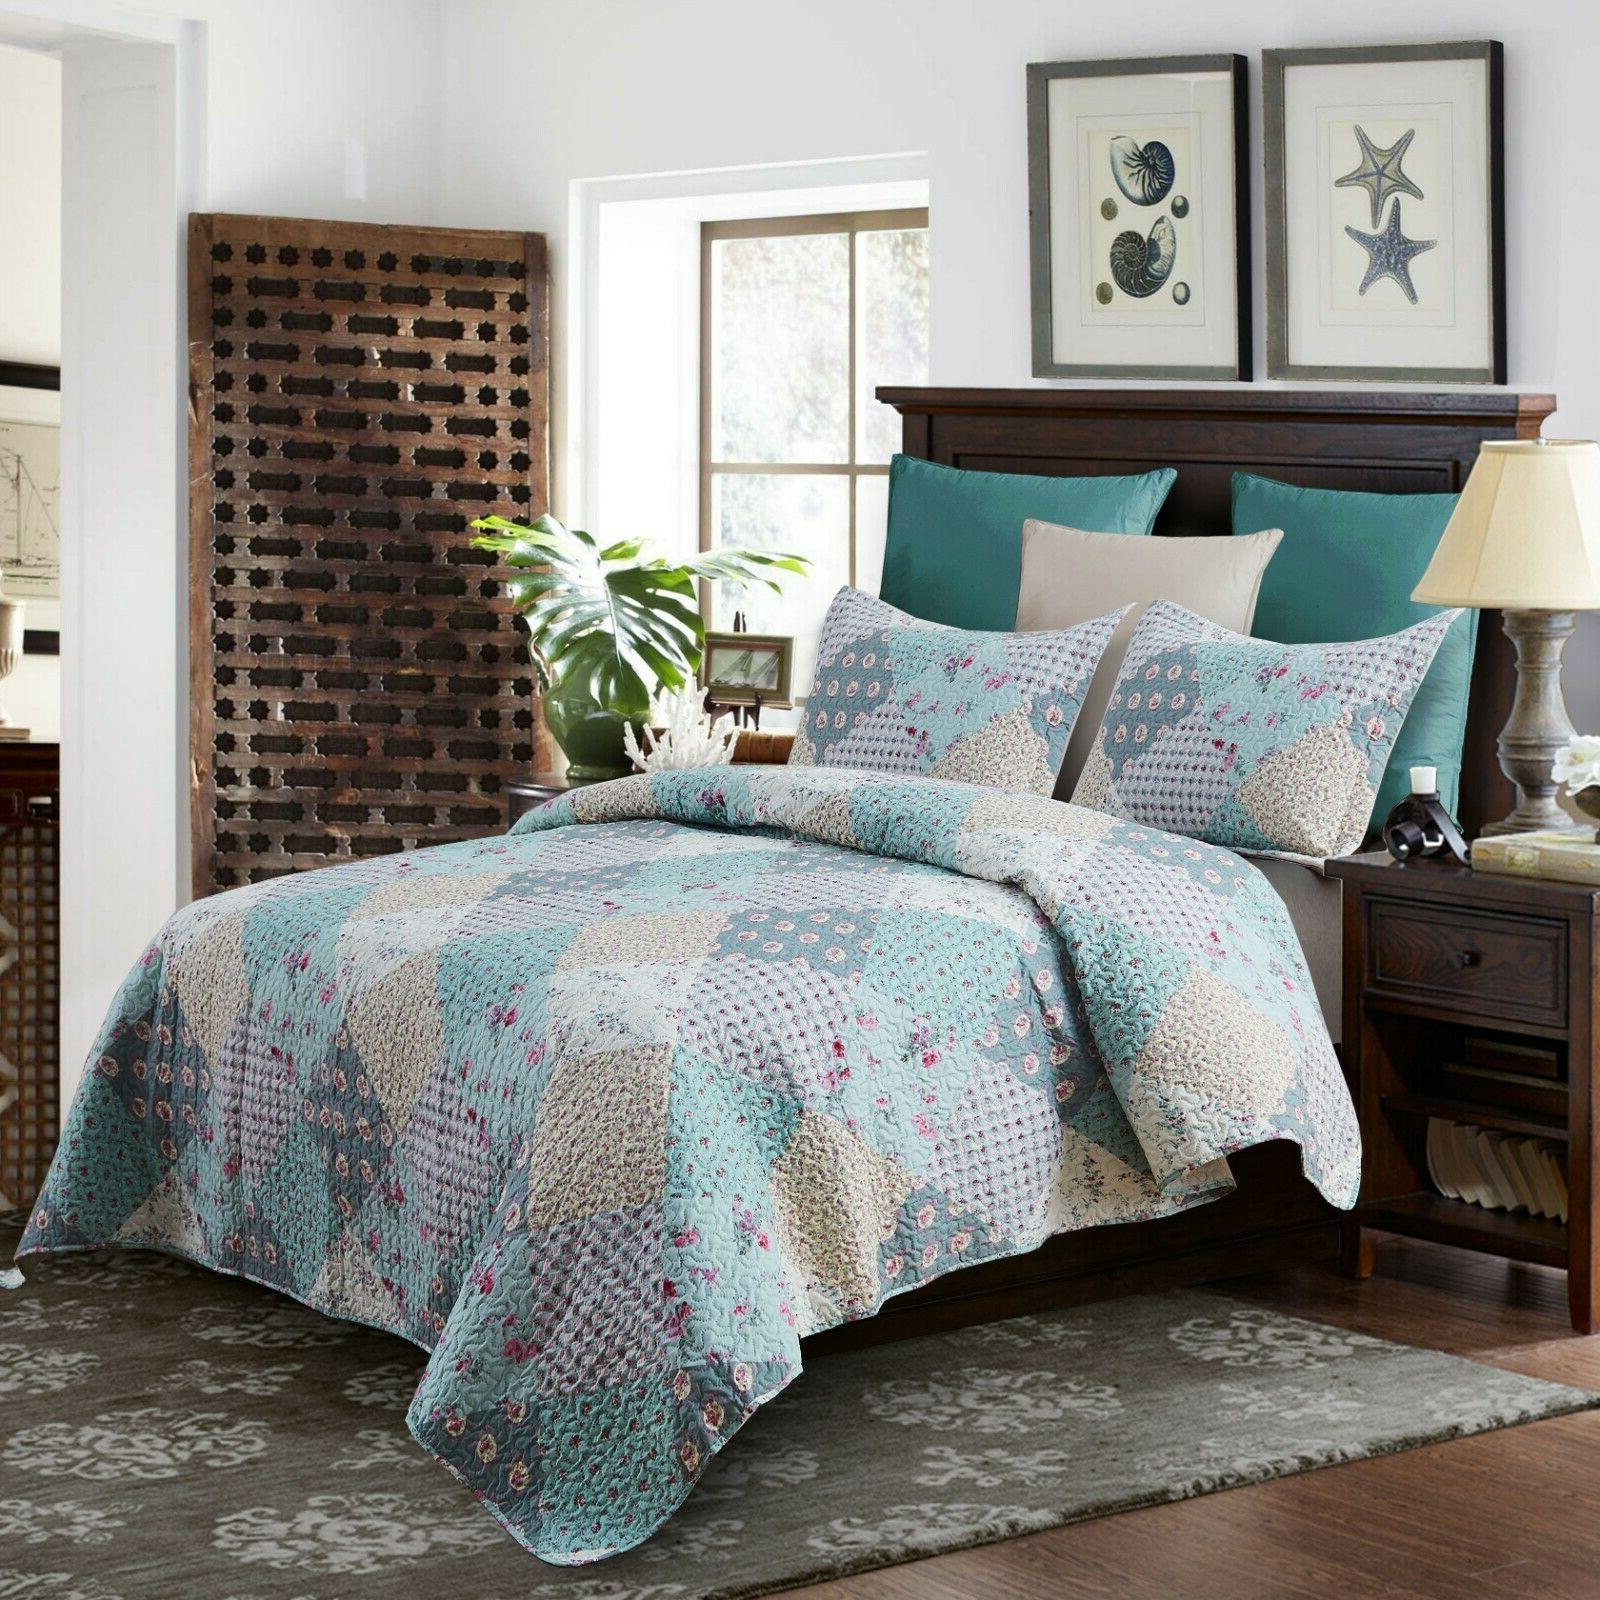 3 Piece Reversible Bedspread Quilt Set Patchwork Coverlet Se